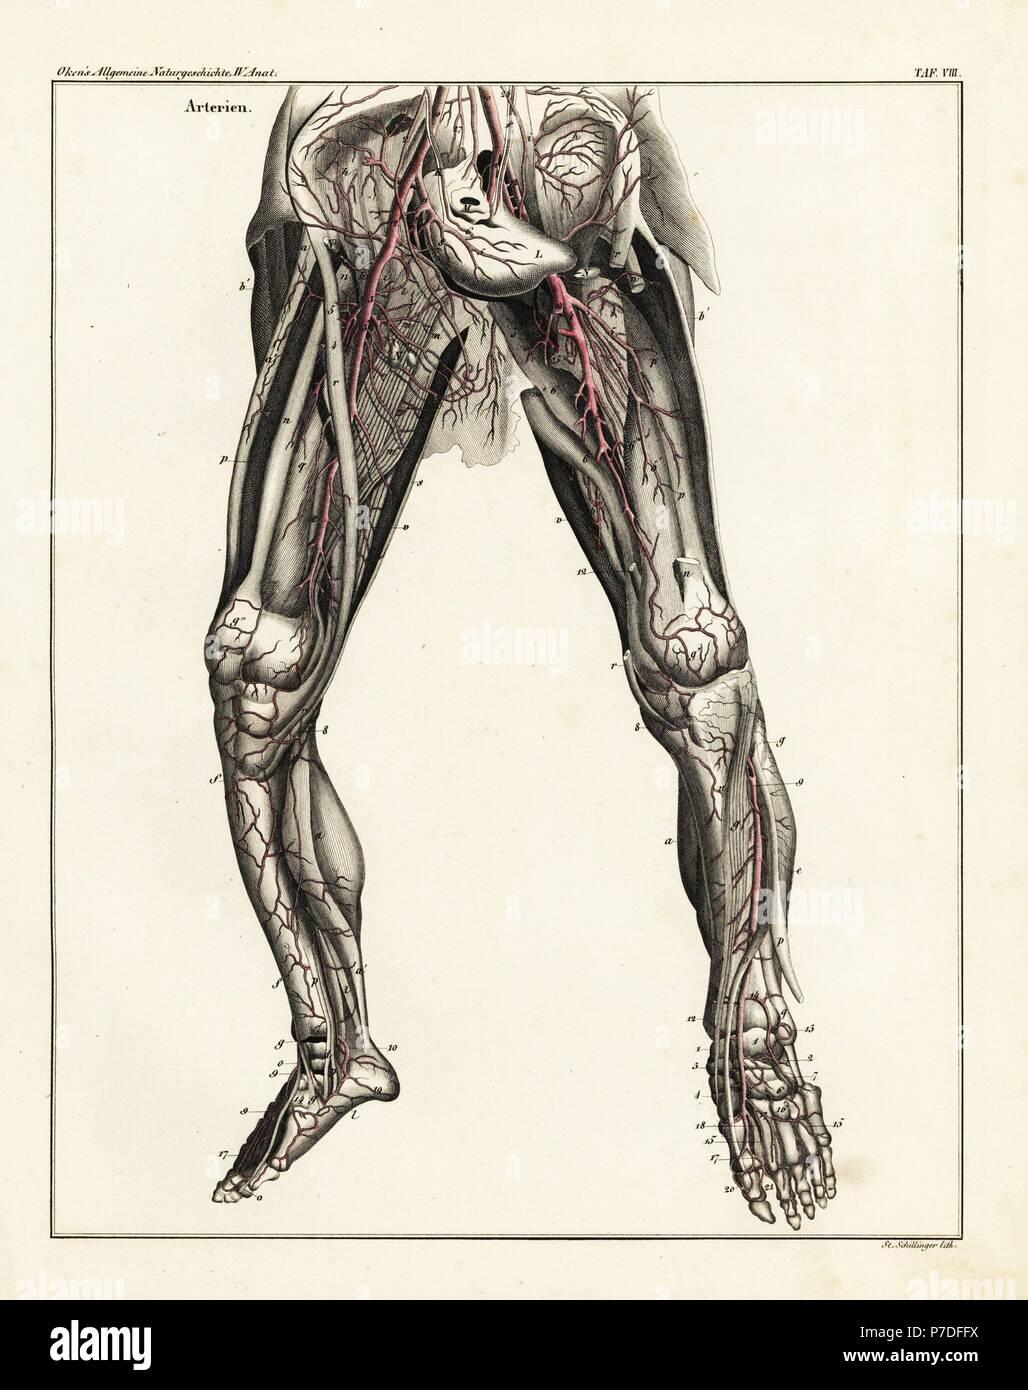 c8.alamy.com/compde/p7dffx/anatomie-des-menschlich...